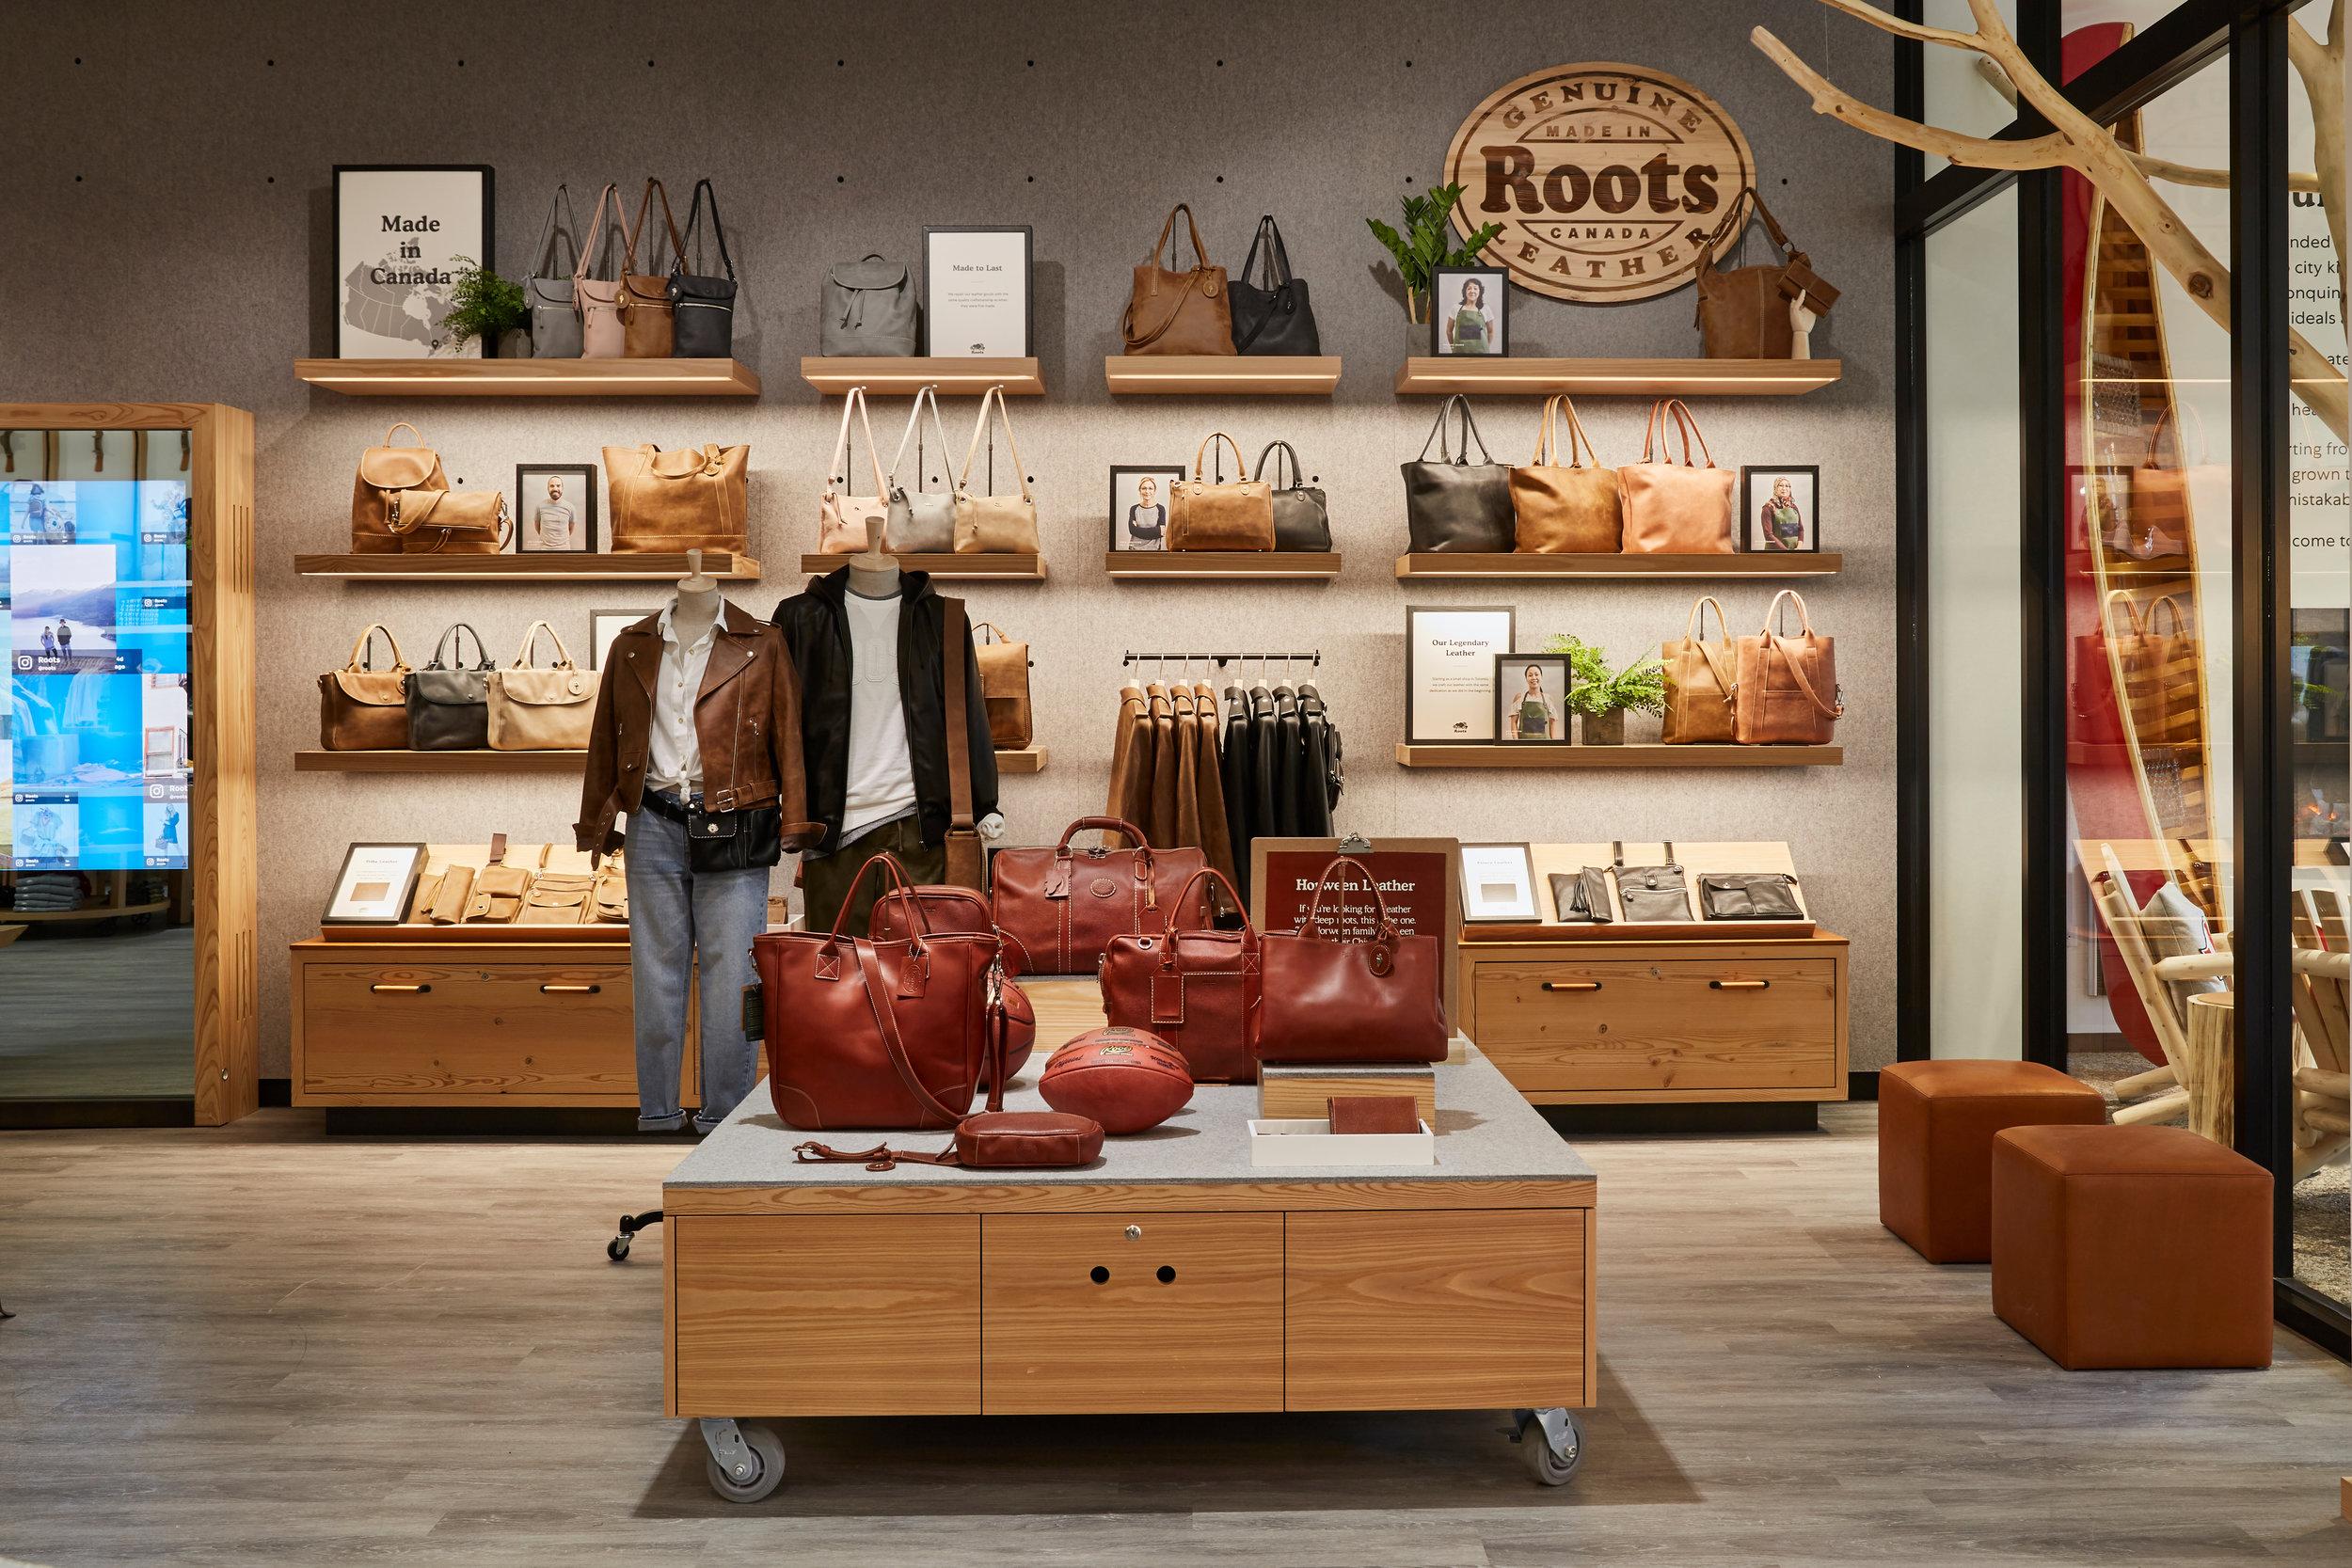 19_0521_RootsStoreChicago_LeatherWide.jpg